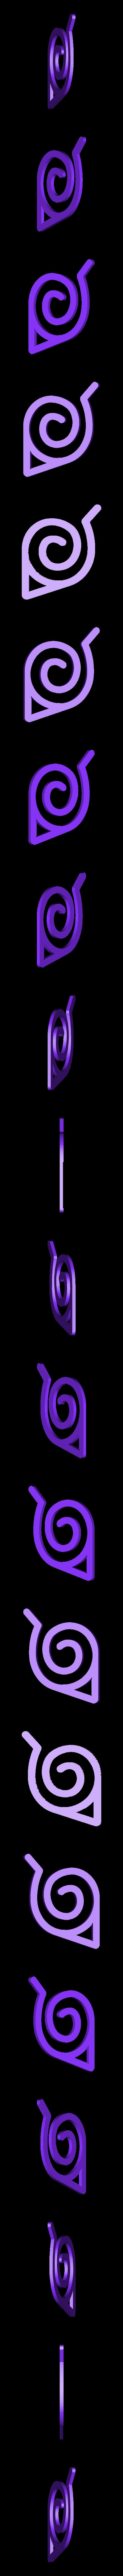 Noir_Naru.stl Download STL file Hand Spinner Naruto • 3D printer template, Guich